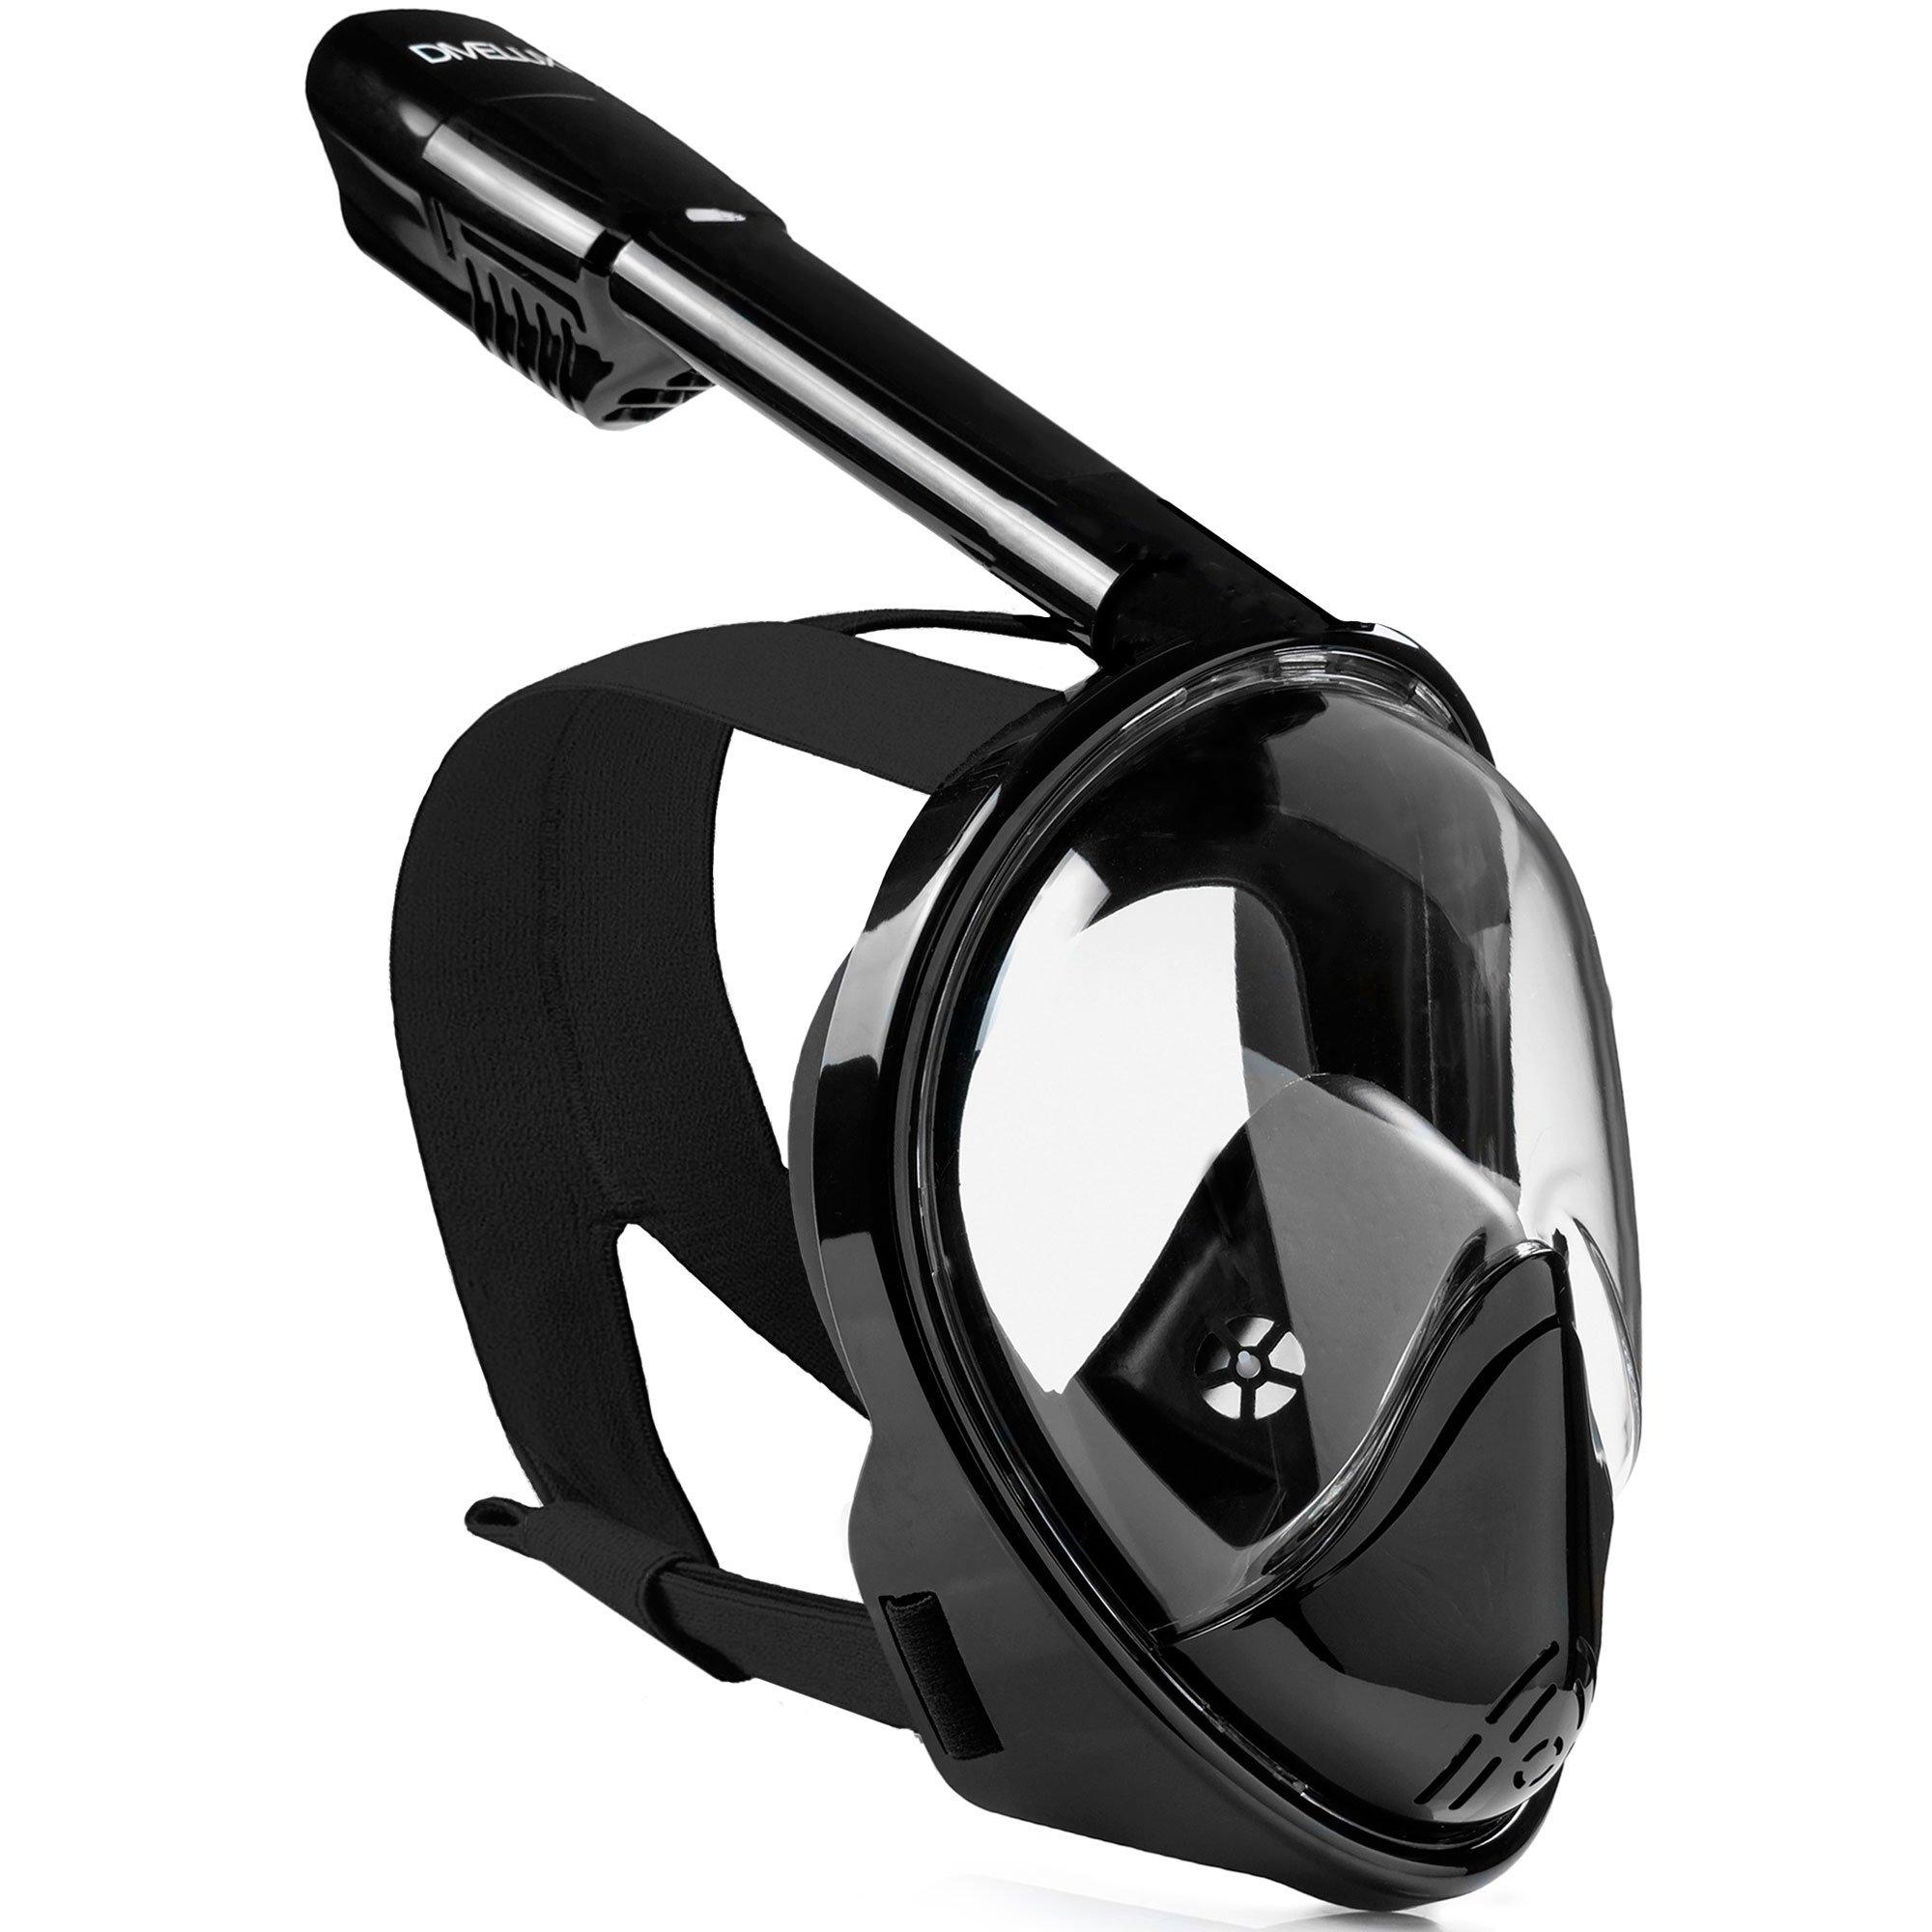 DIVELUX Snorkel Mask - Original Full Face Snorkeling and Diving Mask with 180° Panoramic Viewing - Longer Ventilation Pipe, Watertight, Anti Fog & Anti Leak Technology, (Black, S/M)